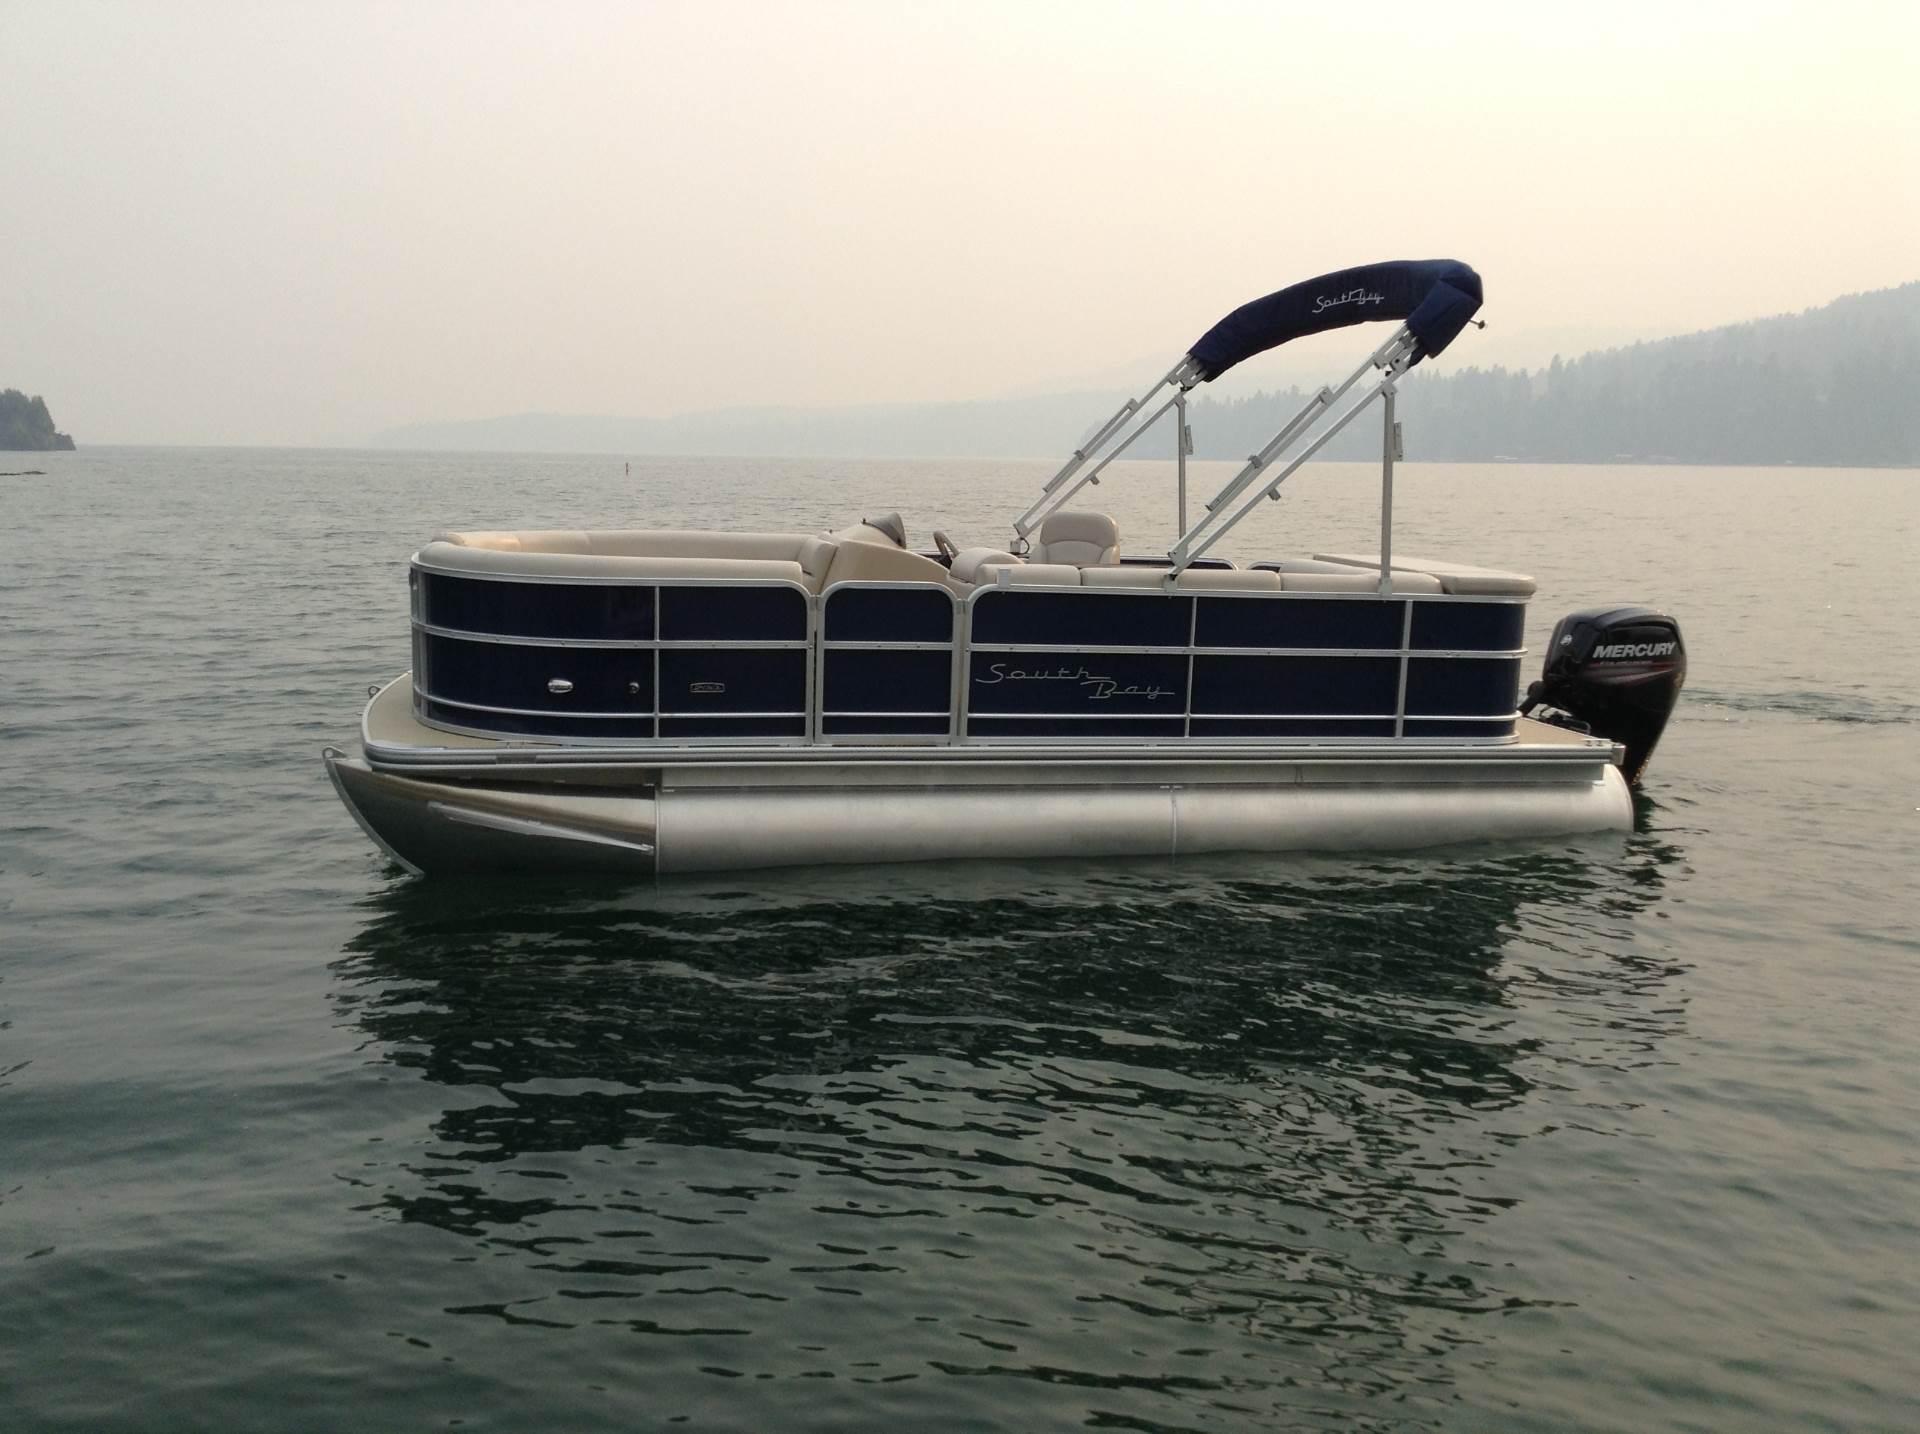 South Bay 220 CR